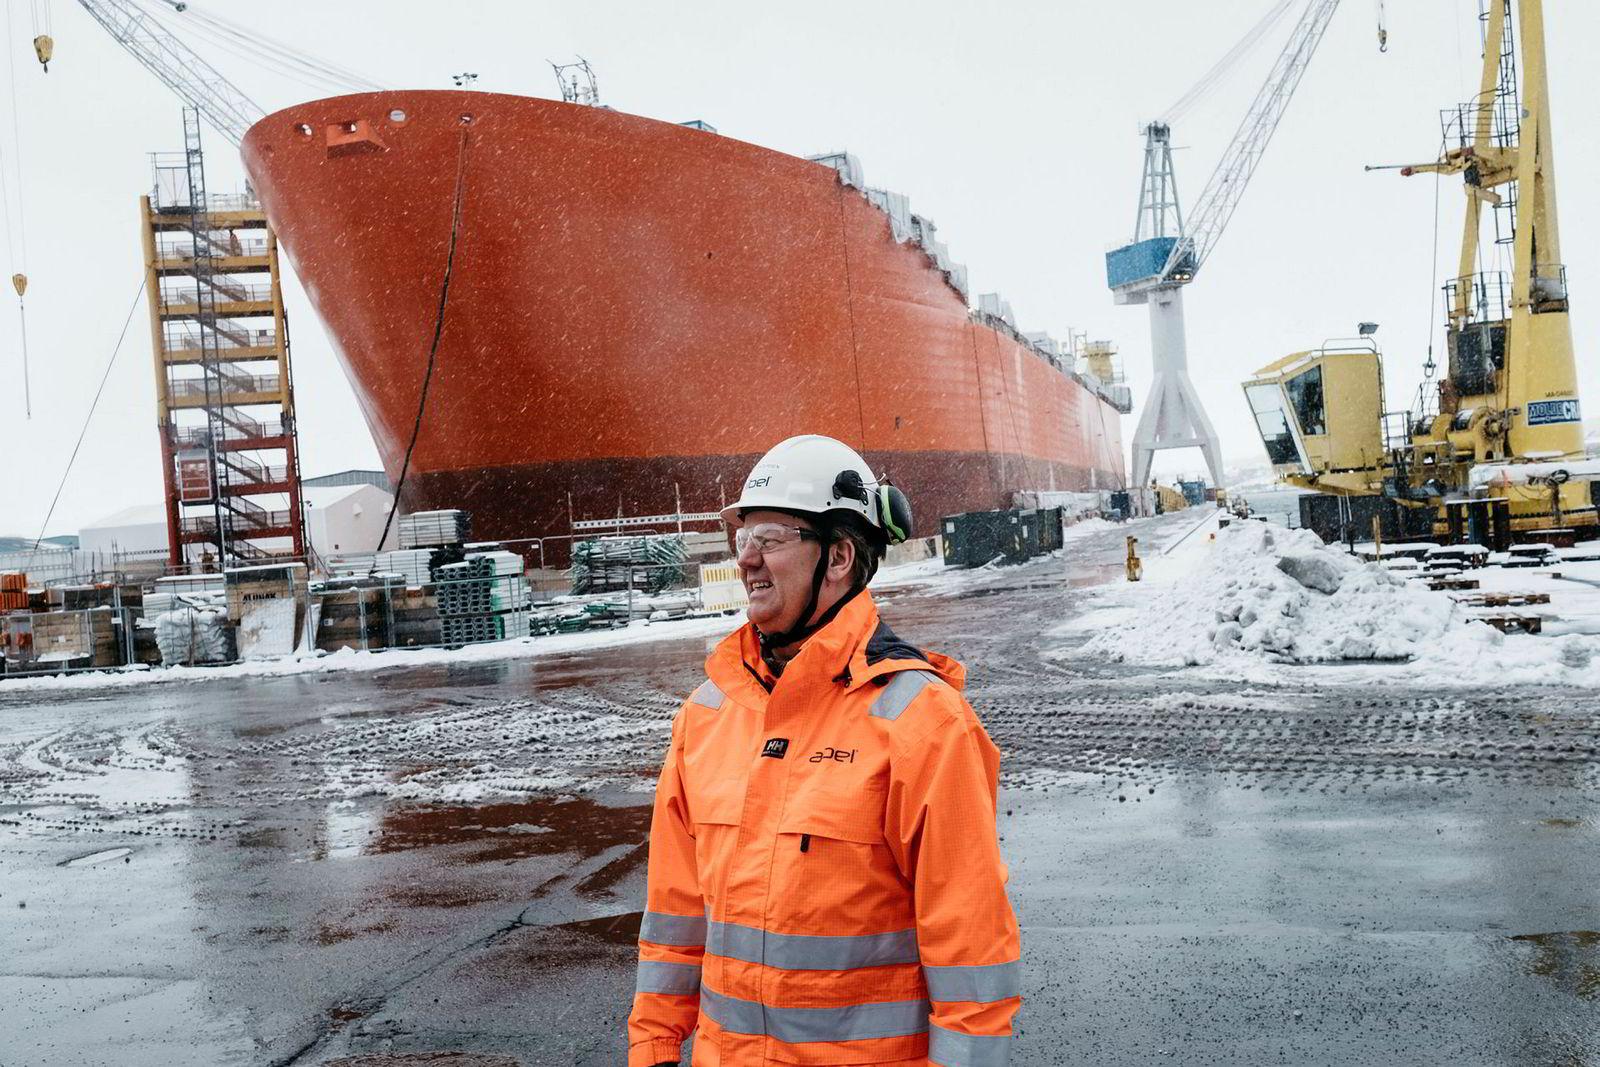 Konsernsjef Mads Andersen i Aibel foran tørrdokken på verftet i Haugesund der lagerskipet til Equinor Njord Bravo ligger inne for oppgraderinger. Kontrakten har en verdi på 1,3 milliarder kroner.